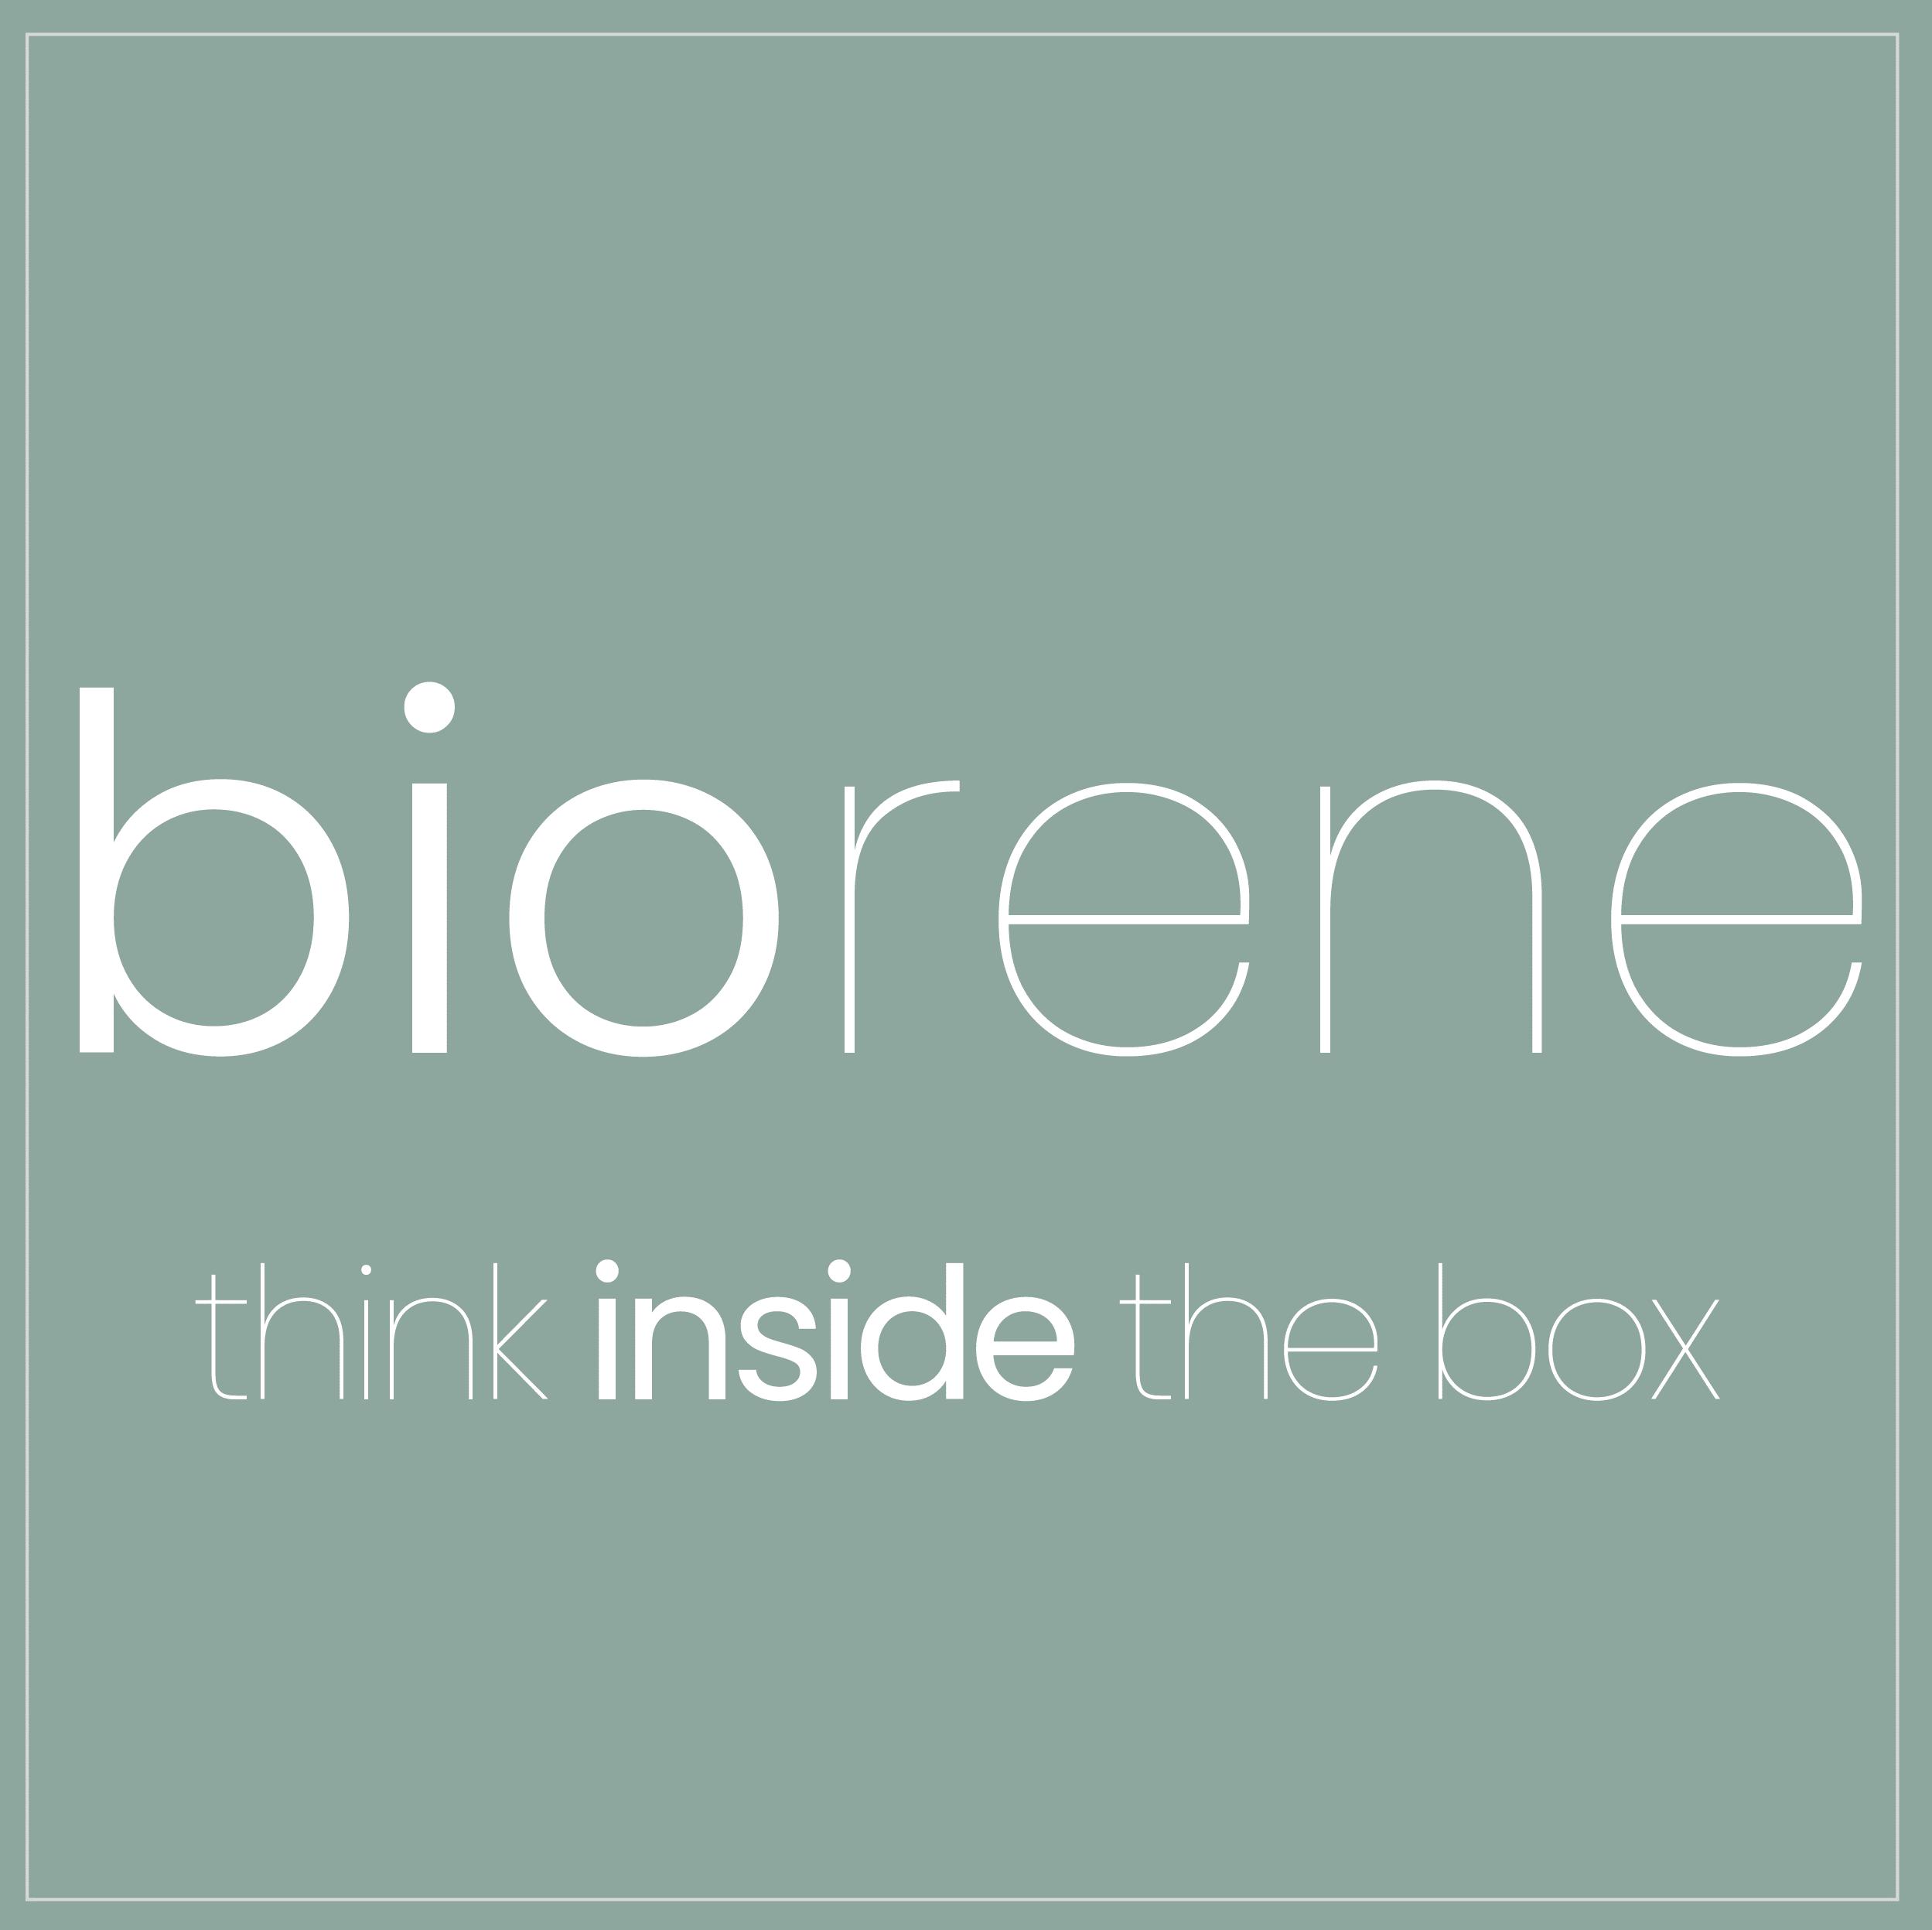 Biorene